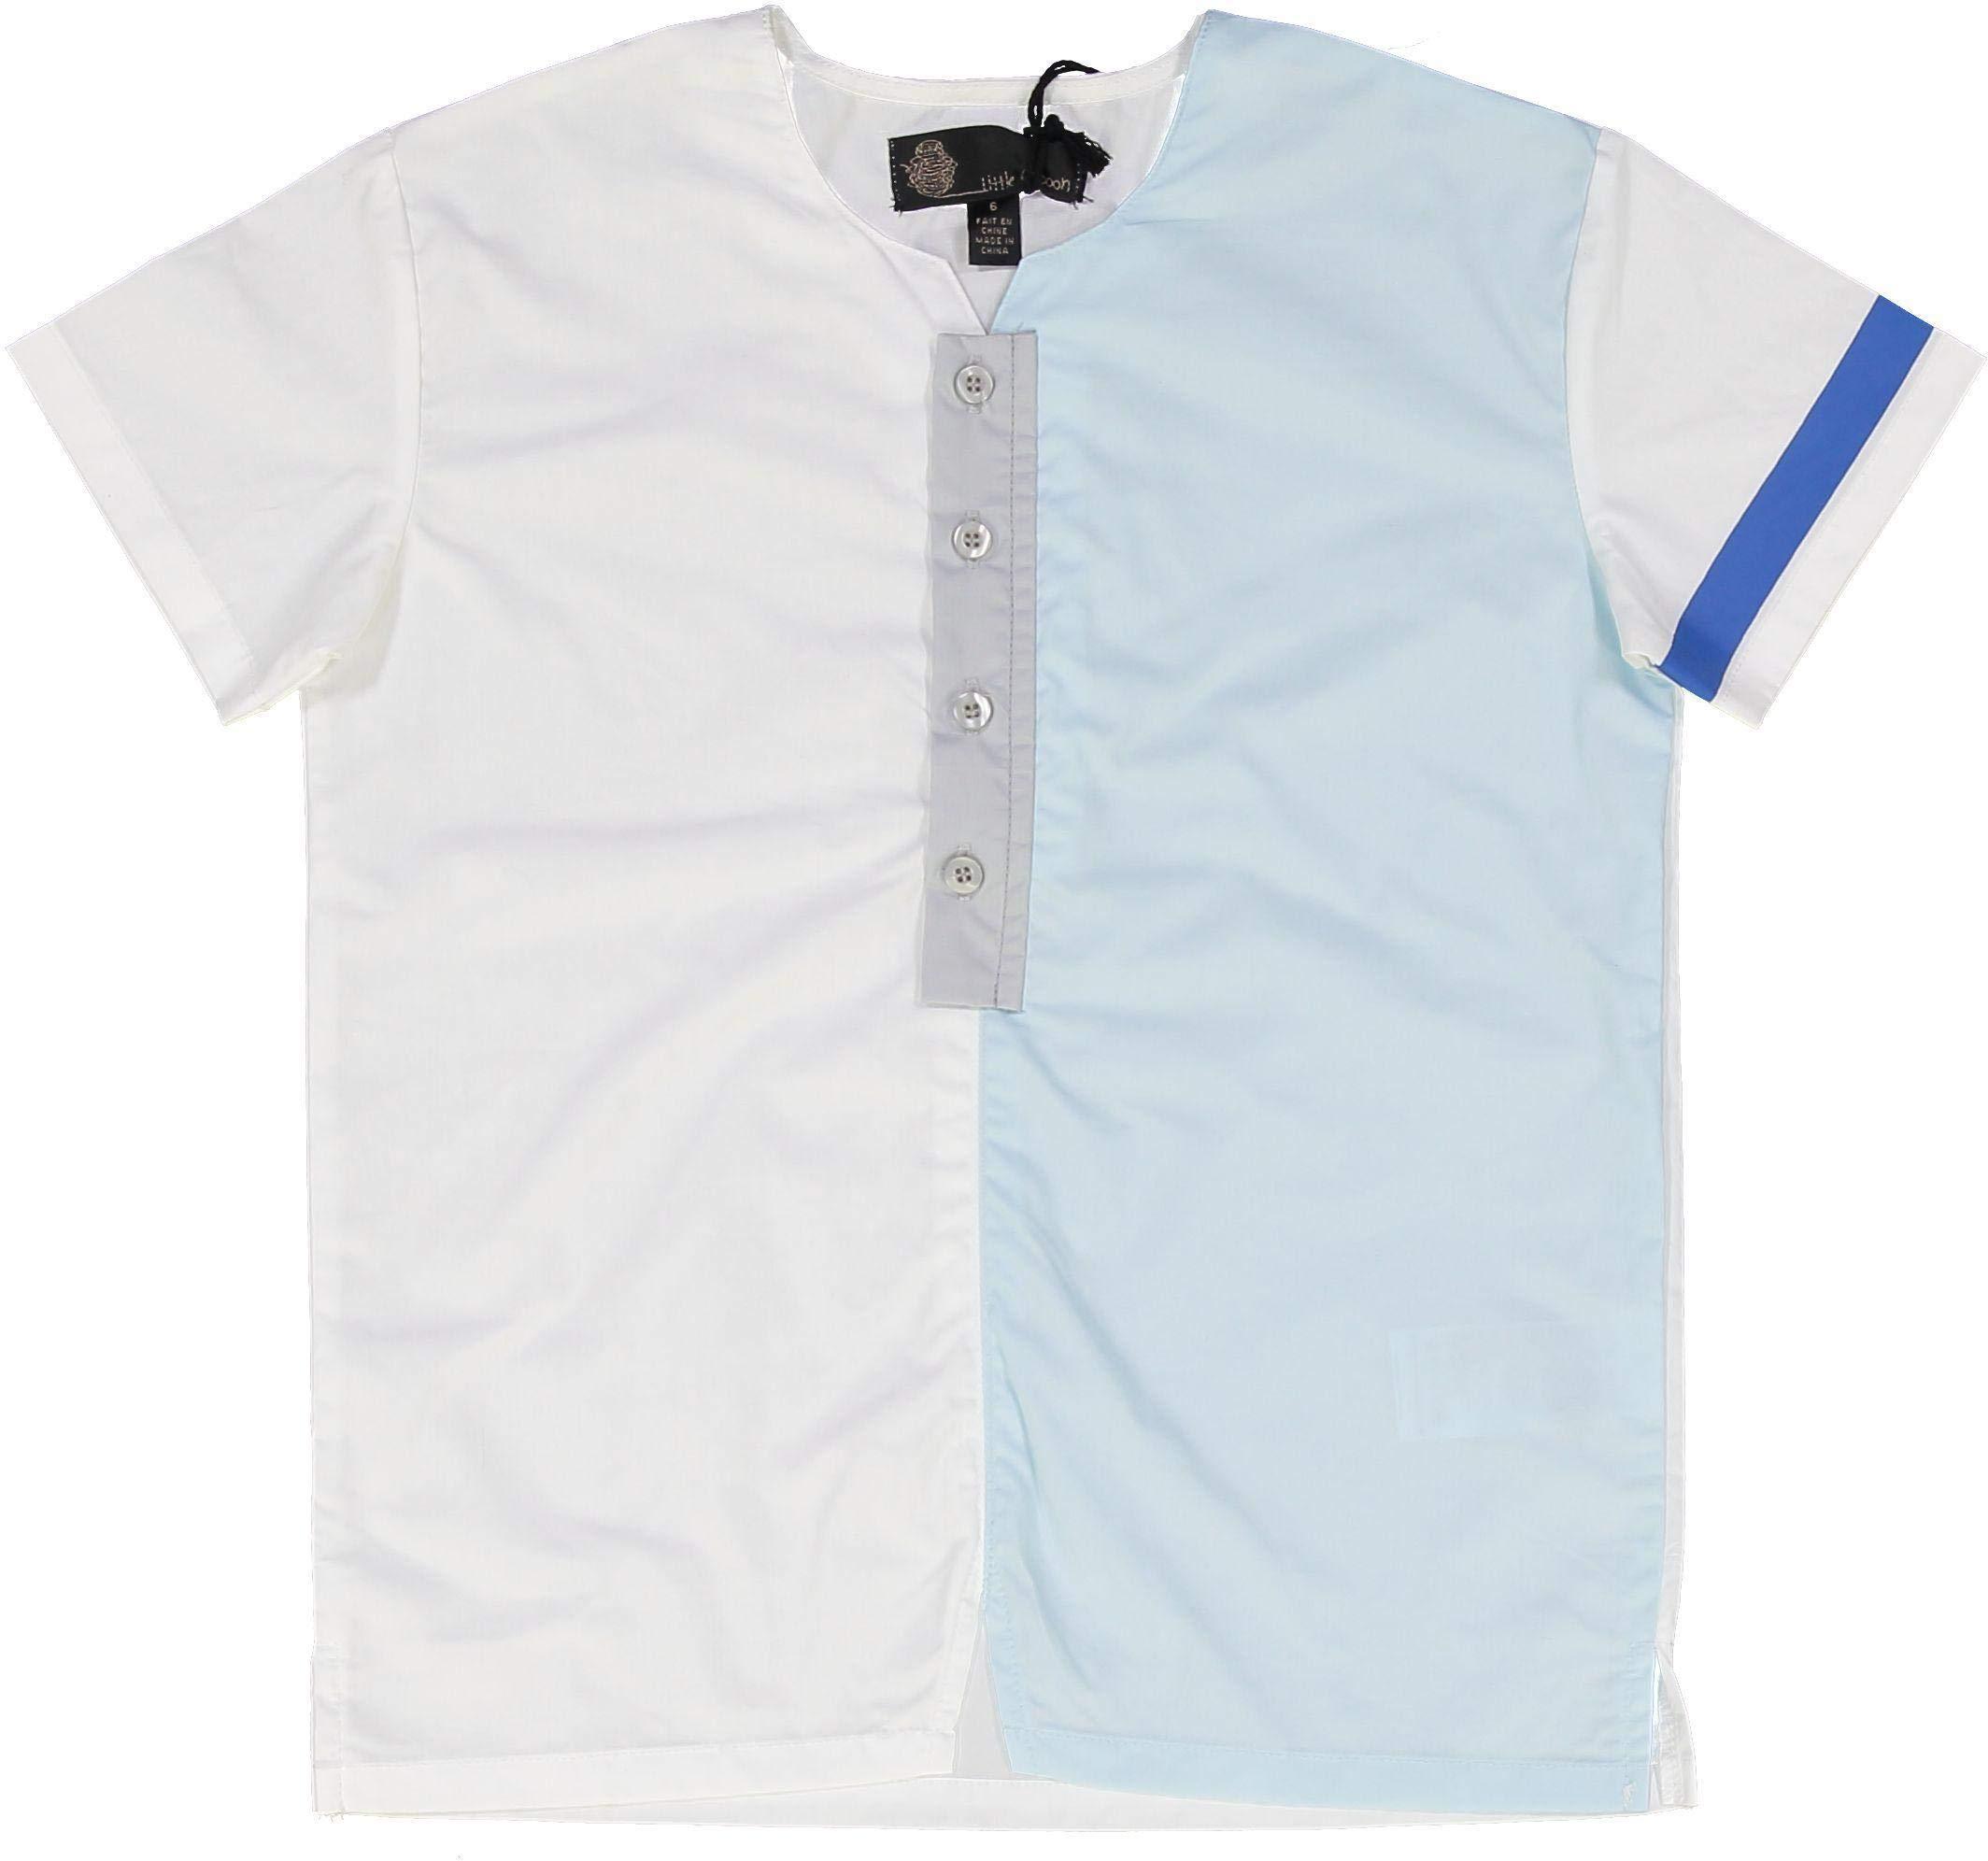 Little Cocoon Boys Short Sleeve Dress Shirt with No Collar - TD1918 - White/Light Blue, 2